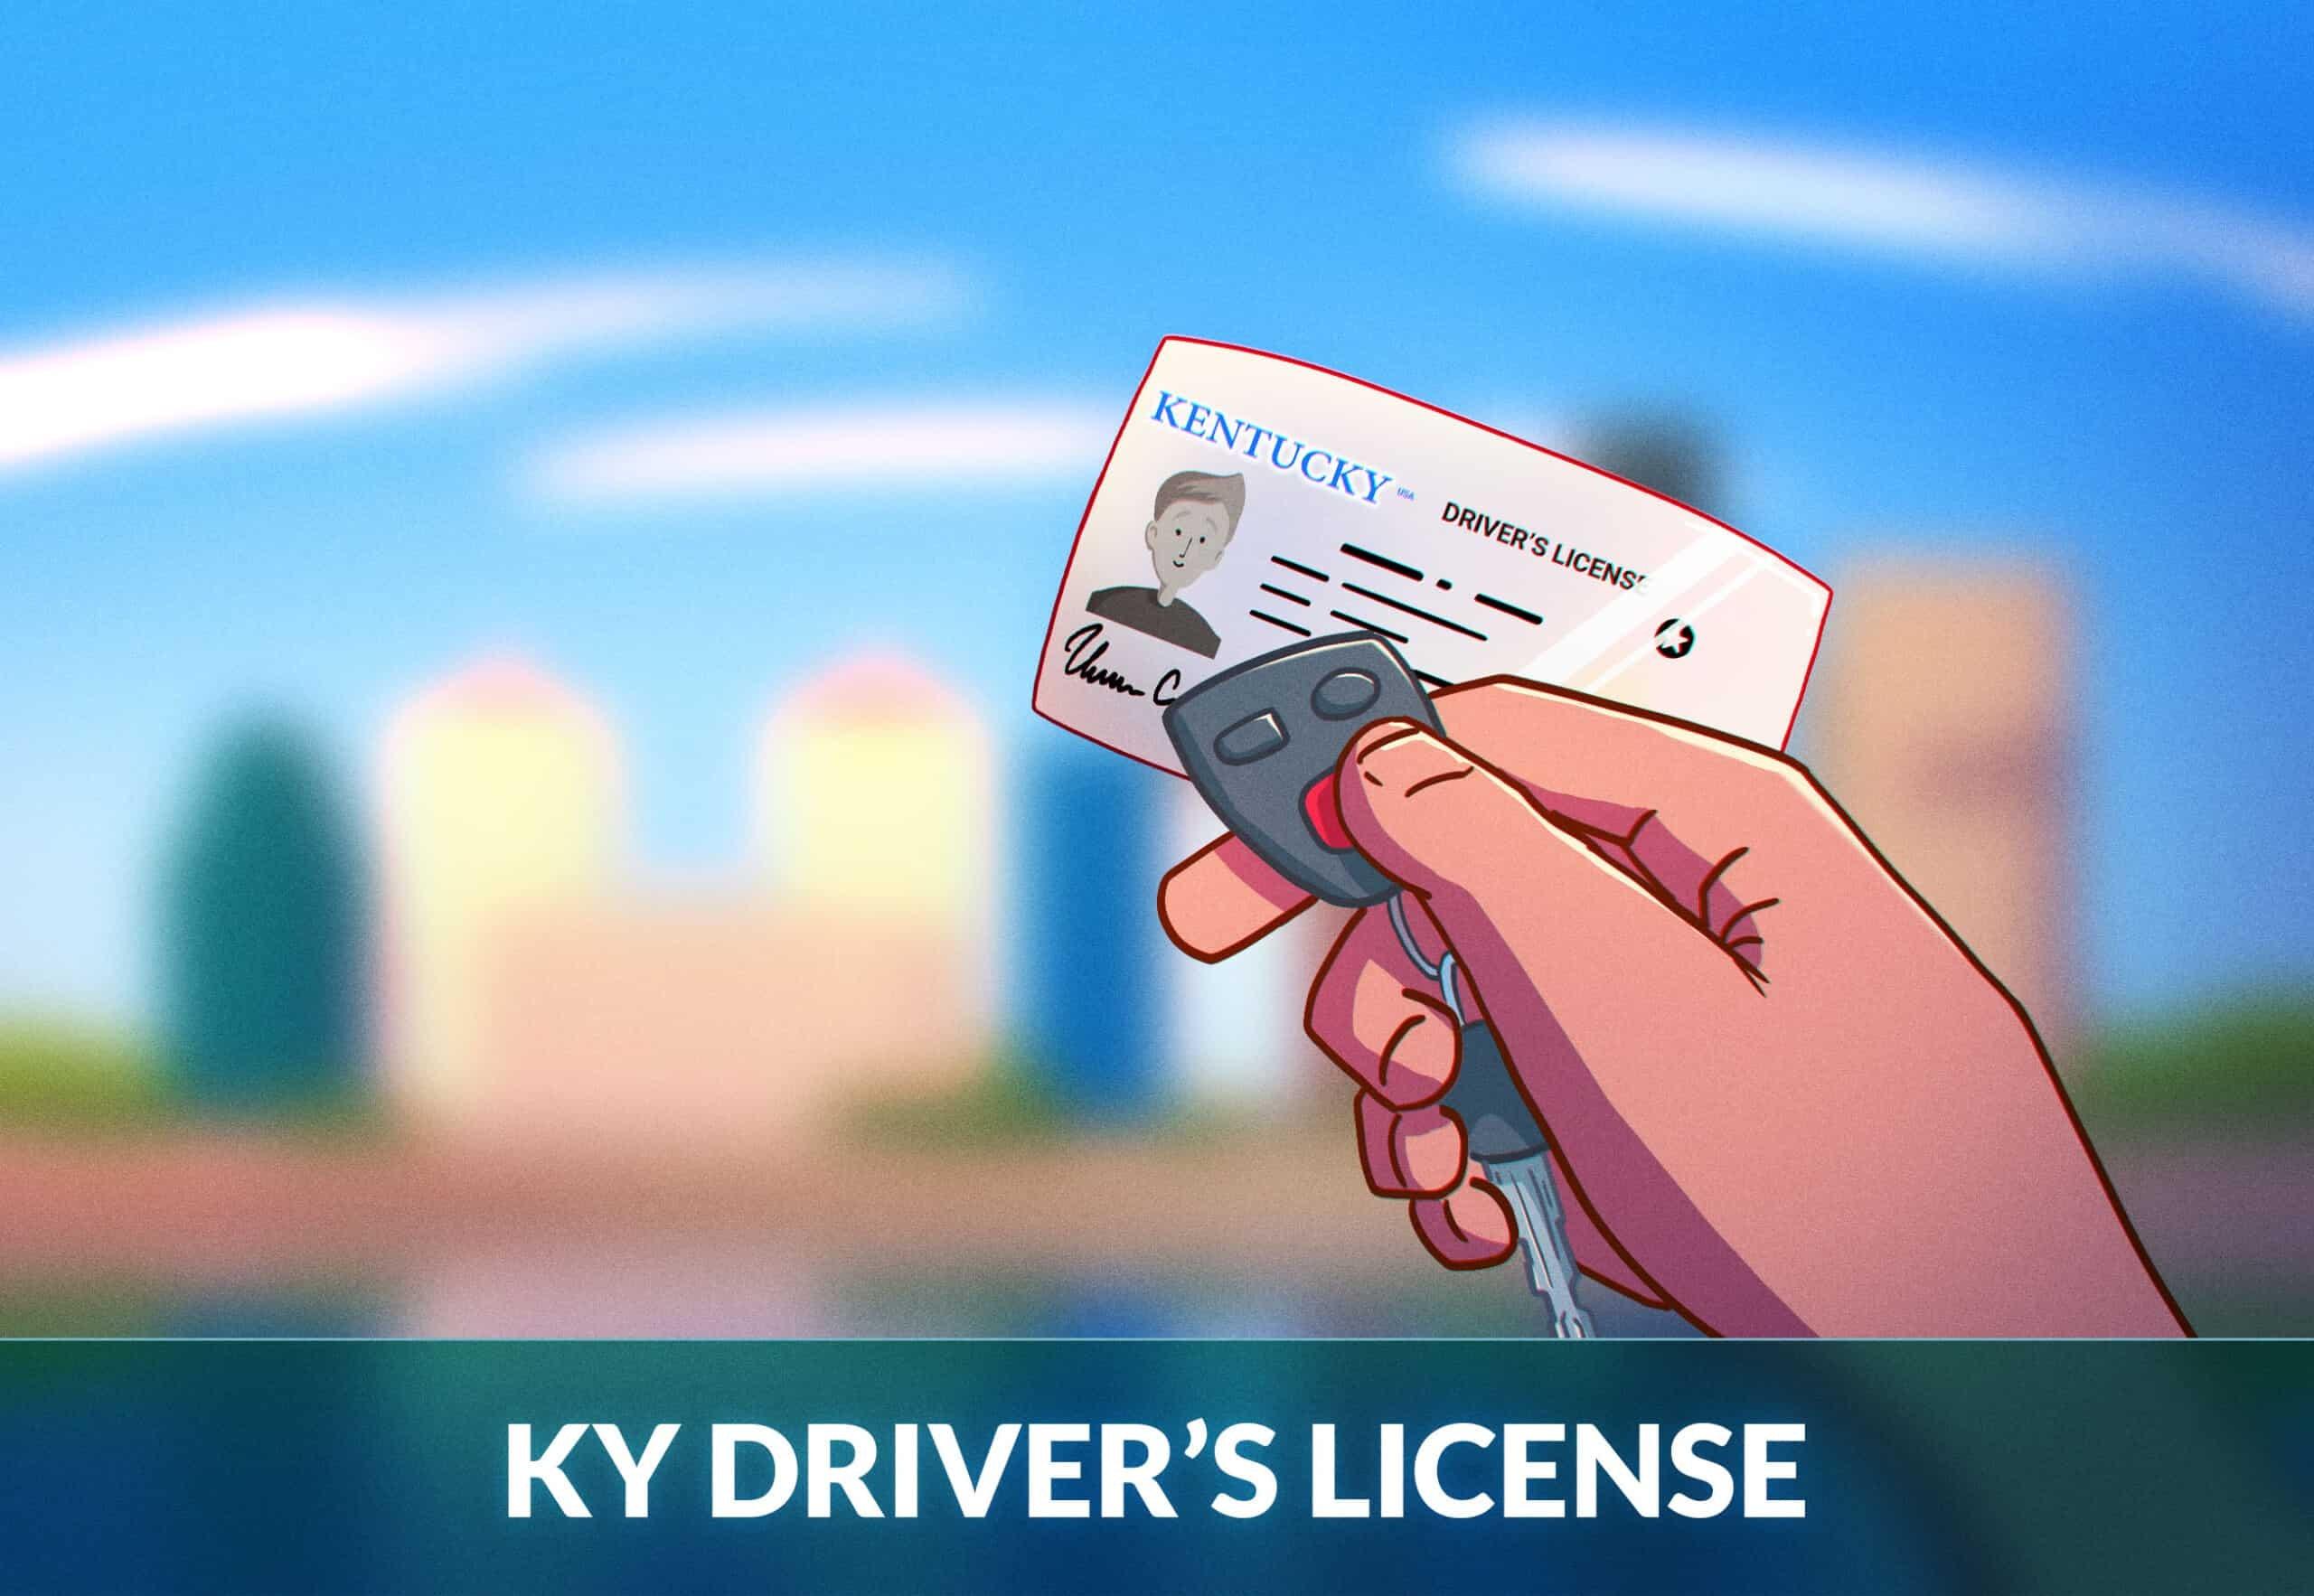 Kentucky Drivers License